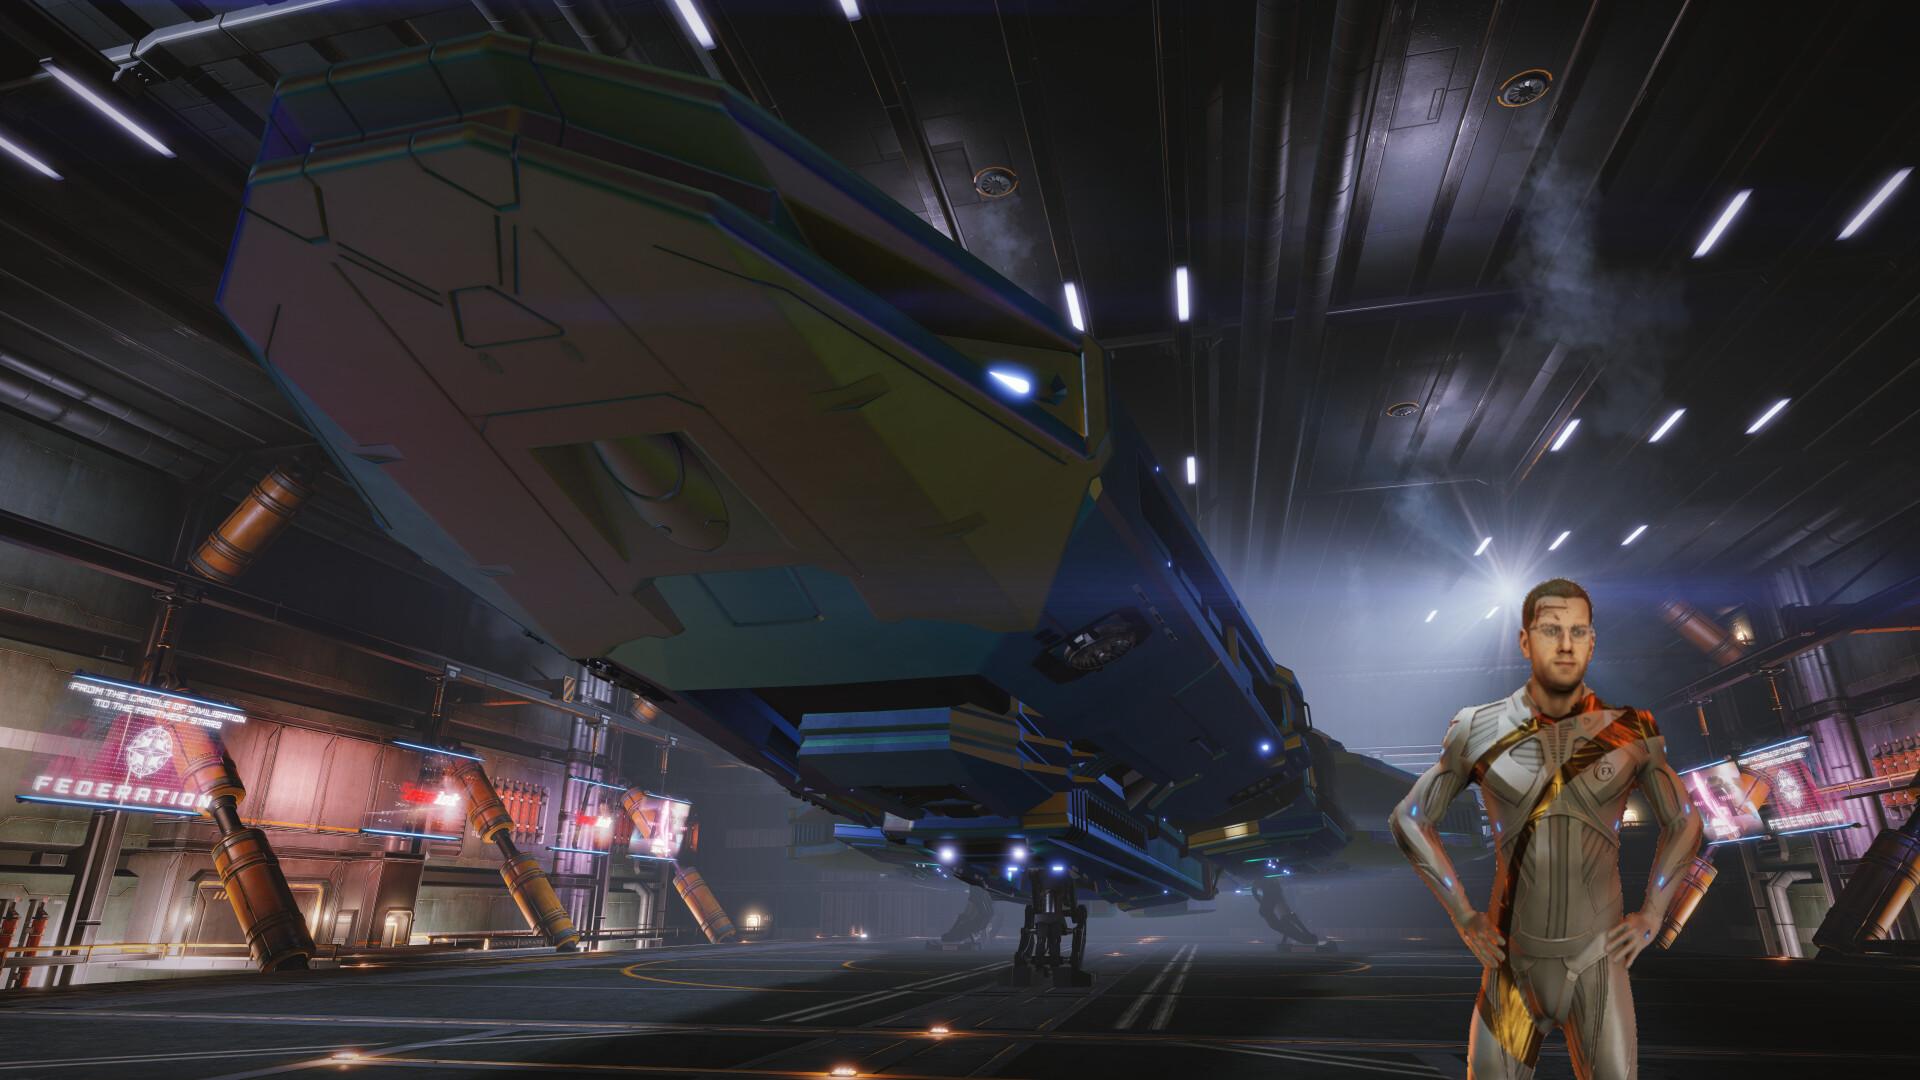 My New ship